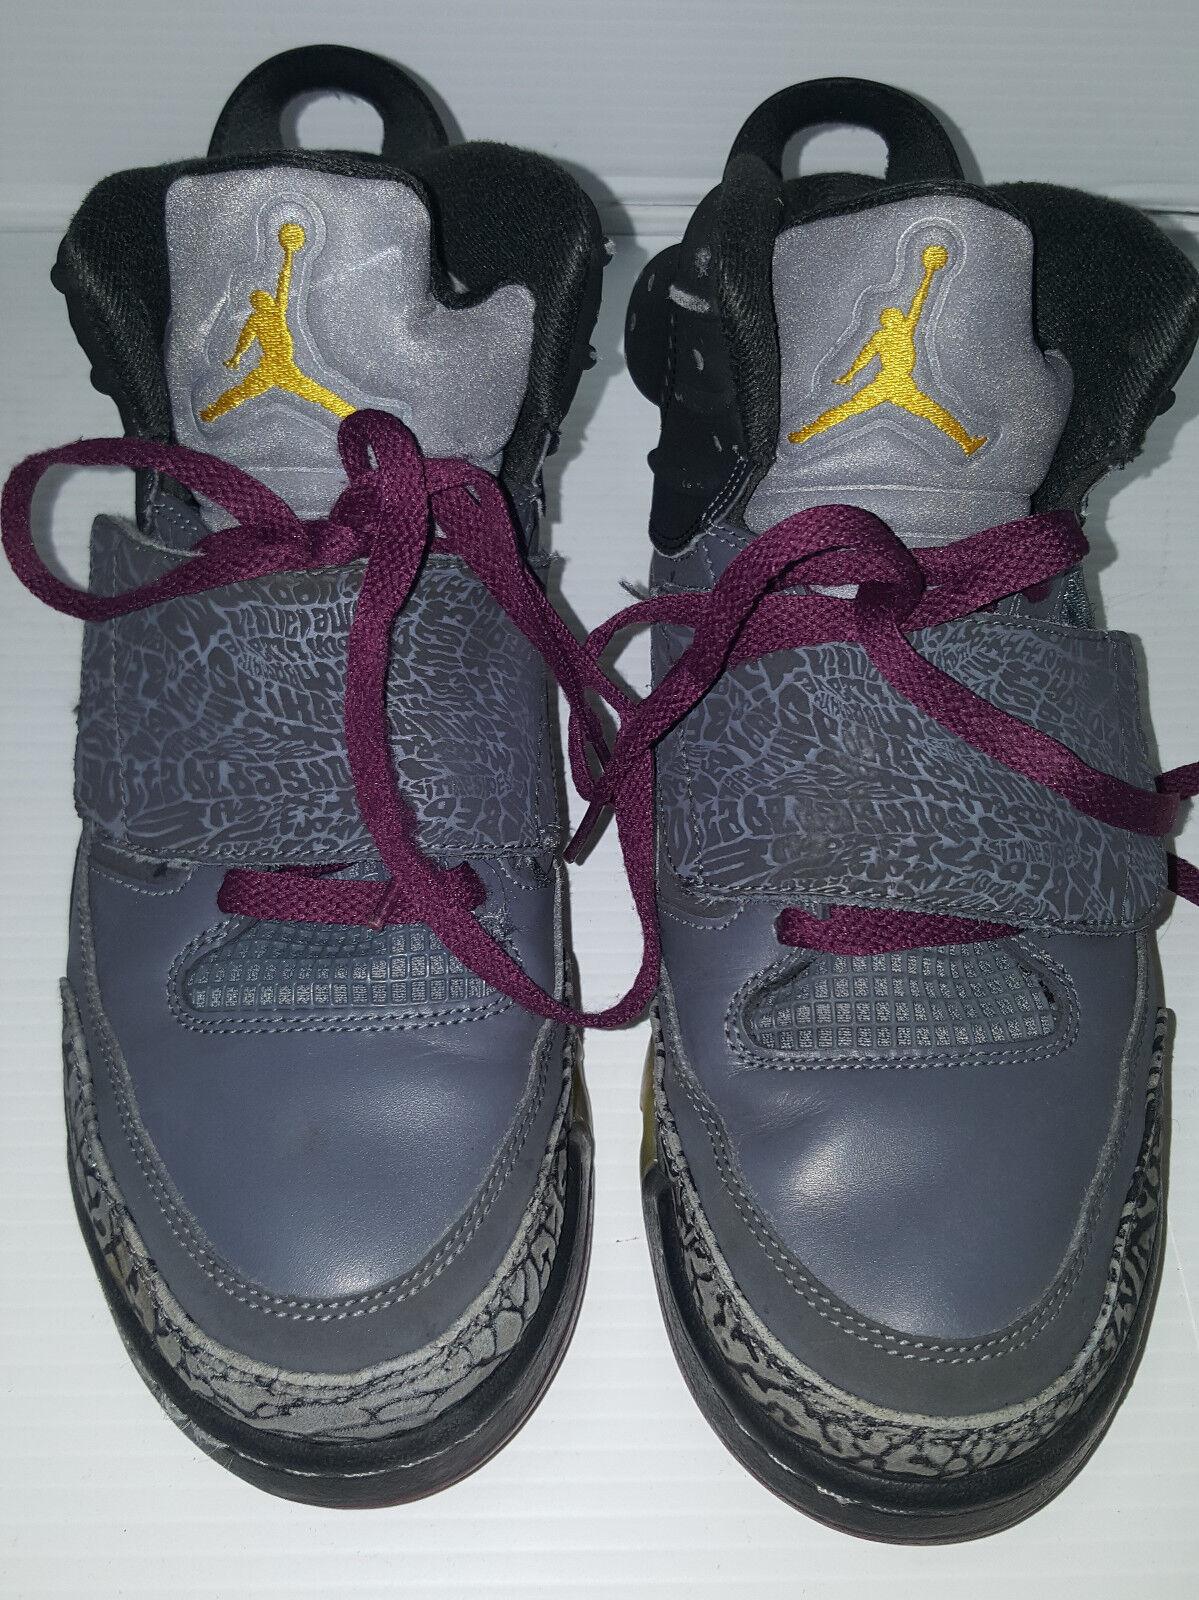 JORDAN Air Nike Mens Sneakers Shoes OF MARS Bordeaux Dark Gray Size 8 Leather